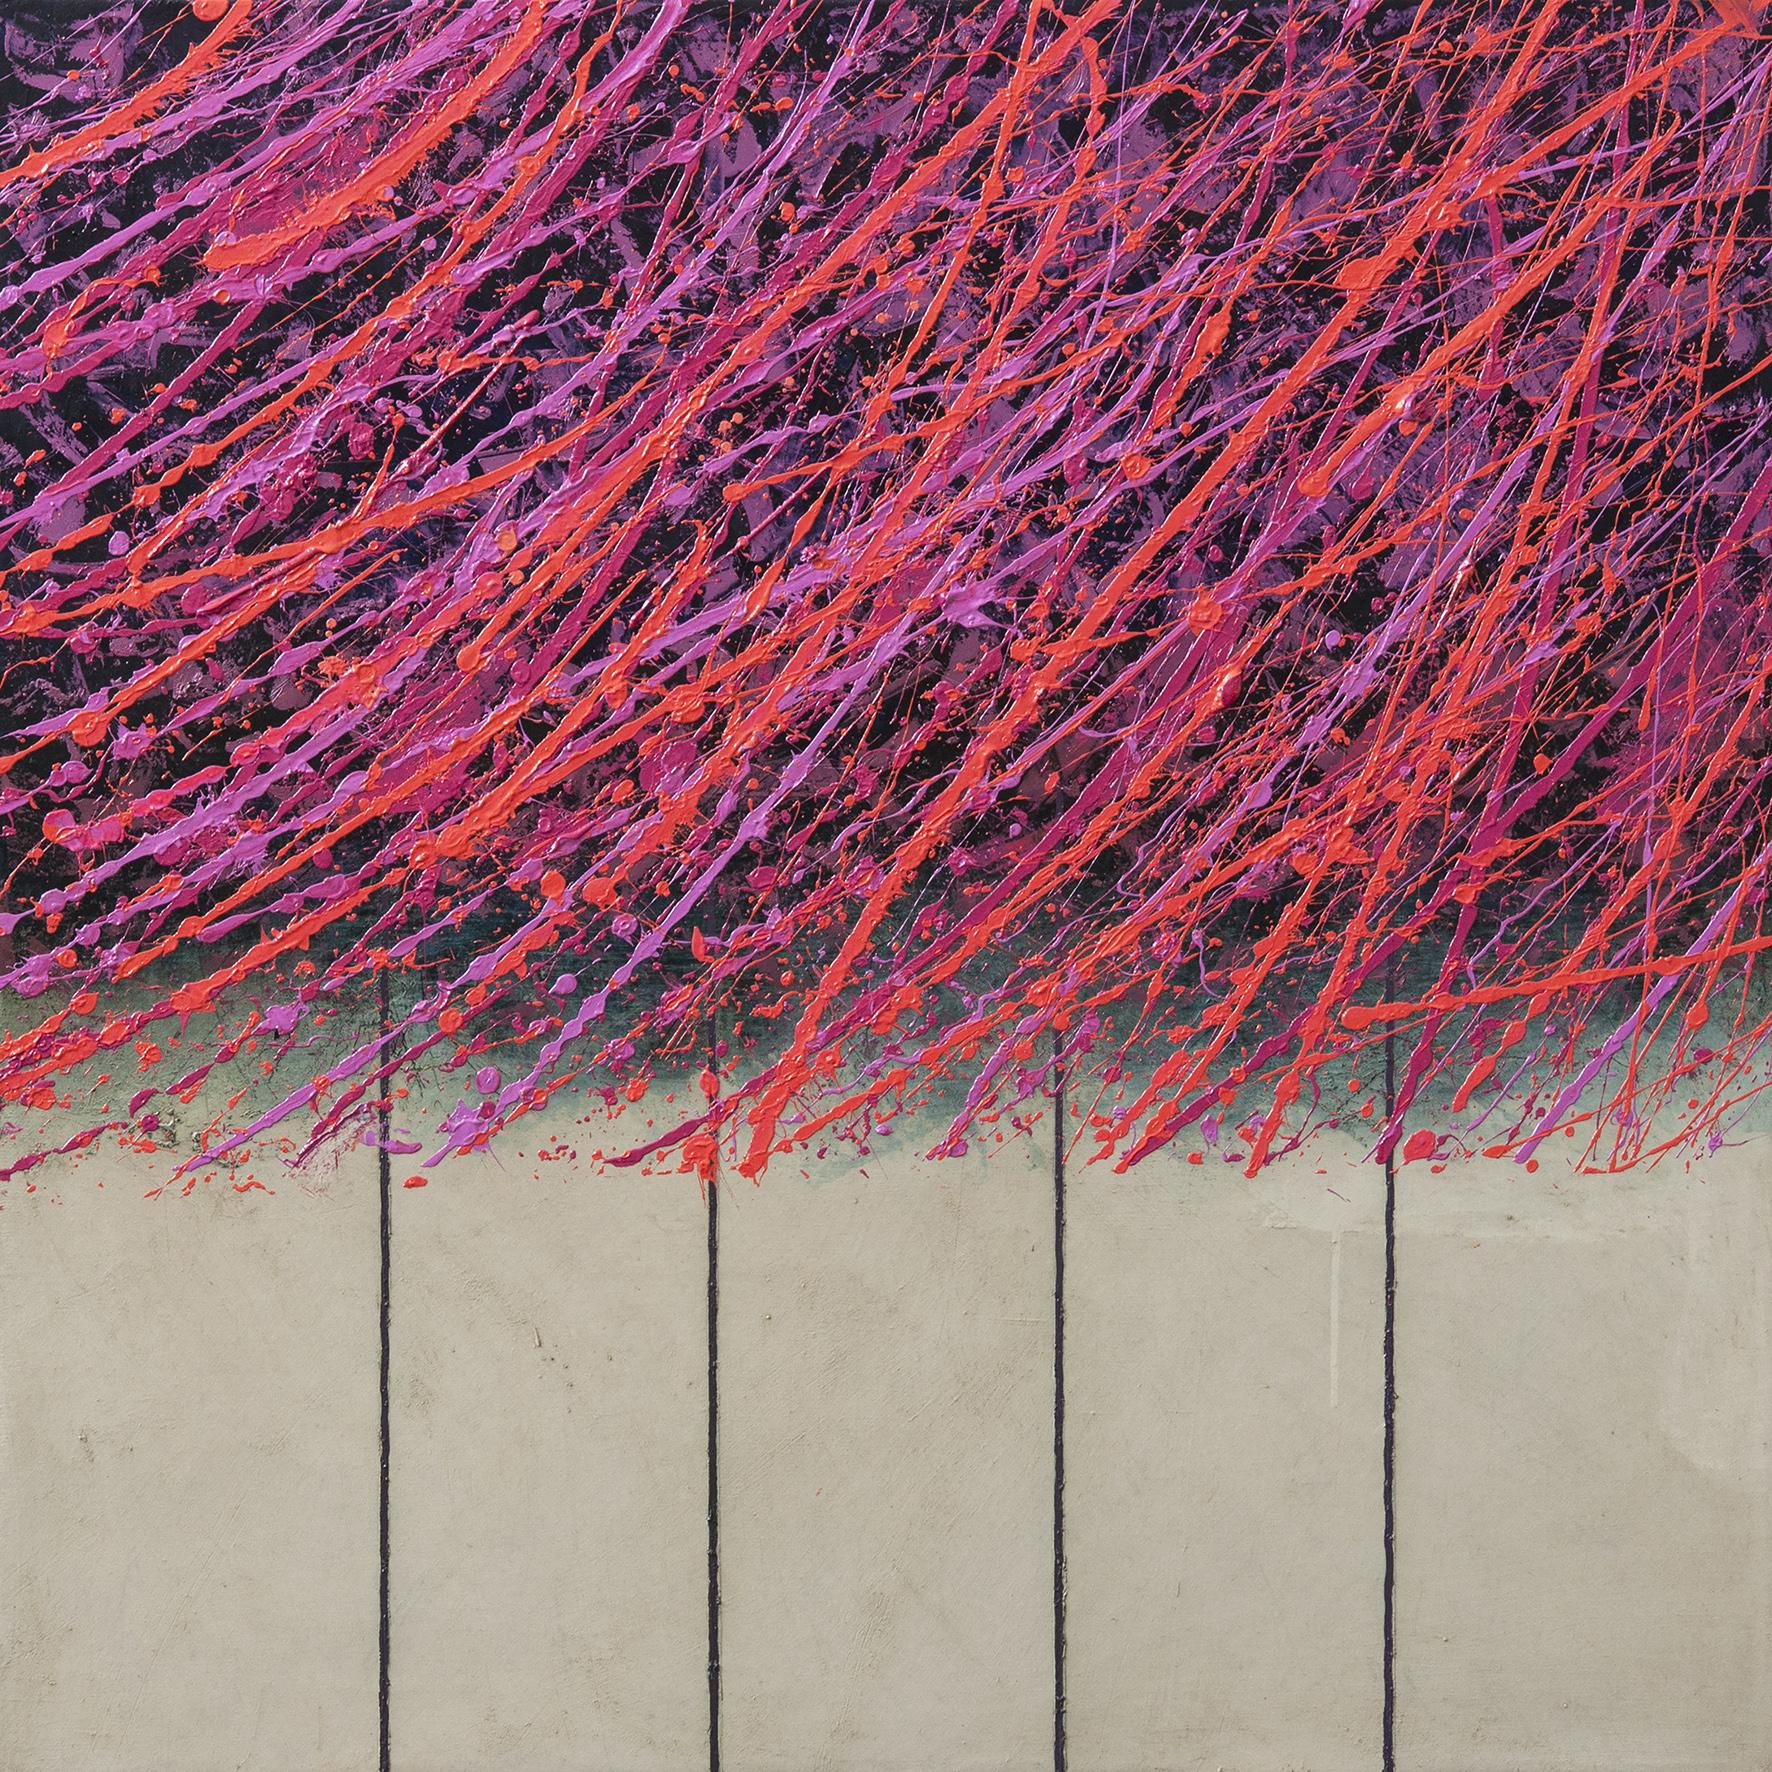 Terra XIV, oil on canvas, 85x85 cm, 2015